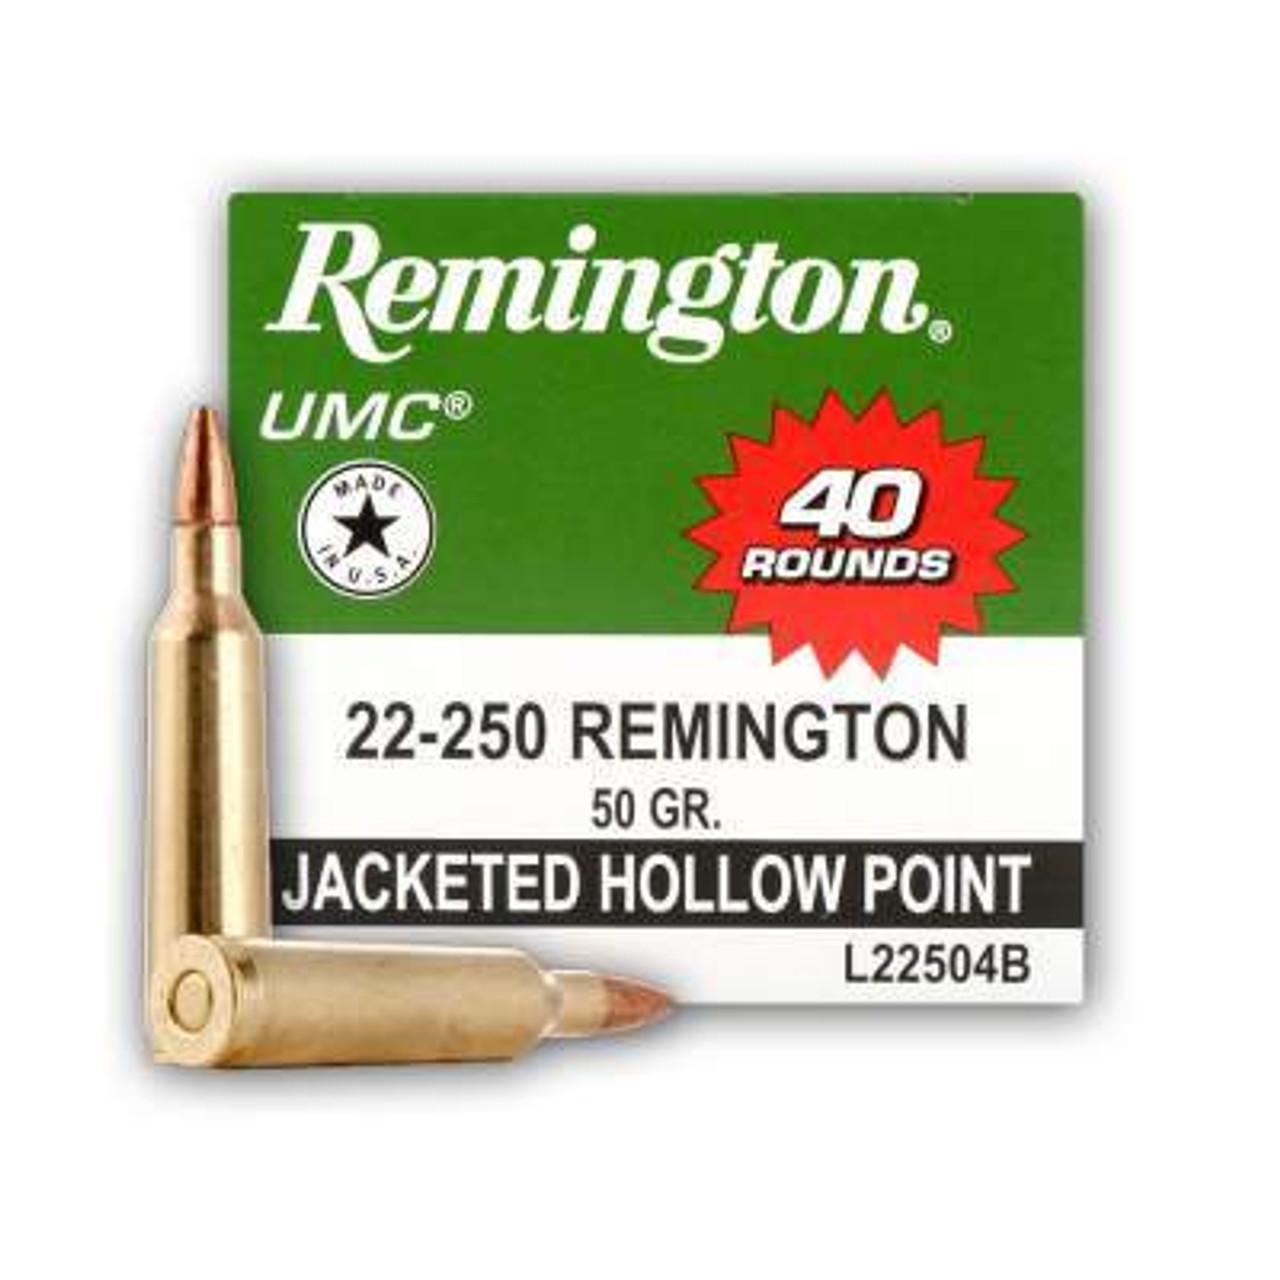 22-250 Ammo